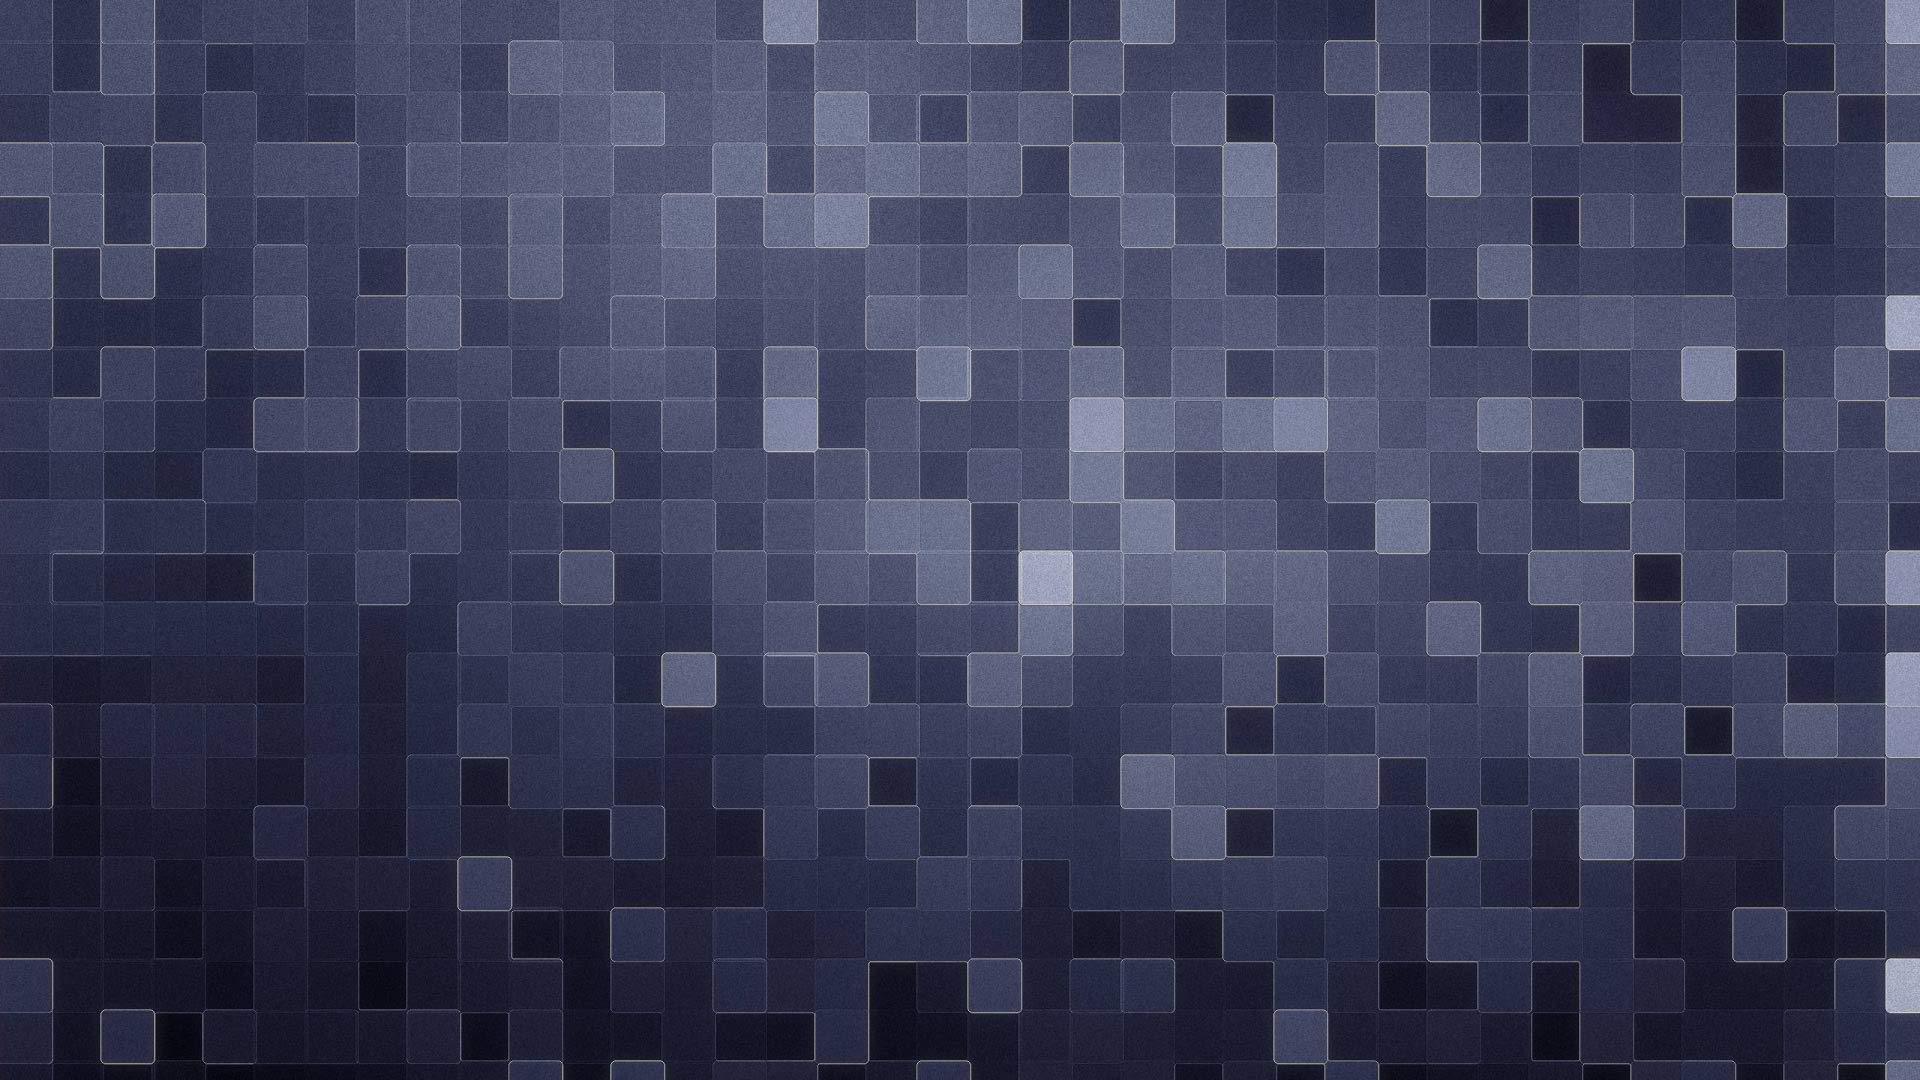 Best Abstract Wallpaper